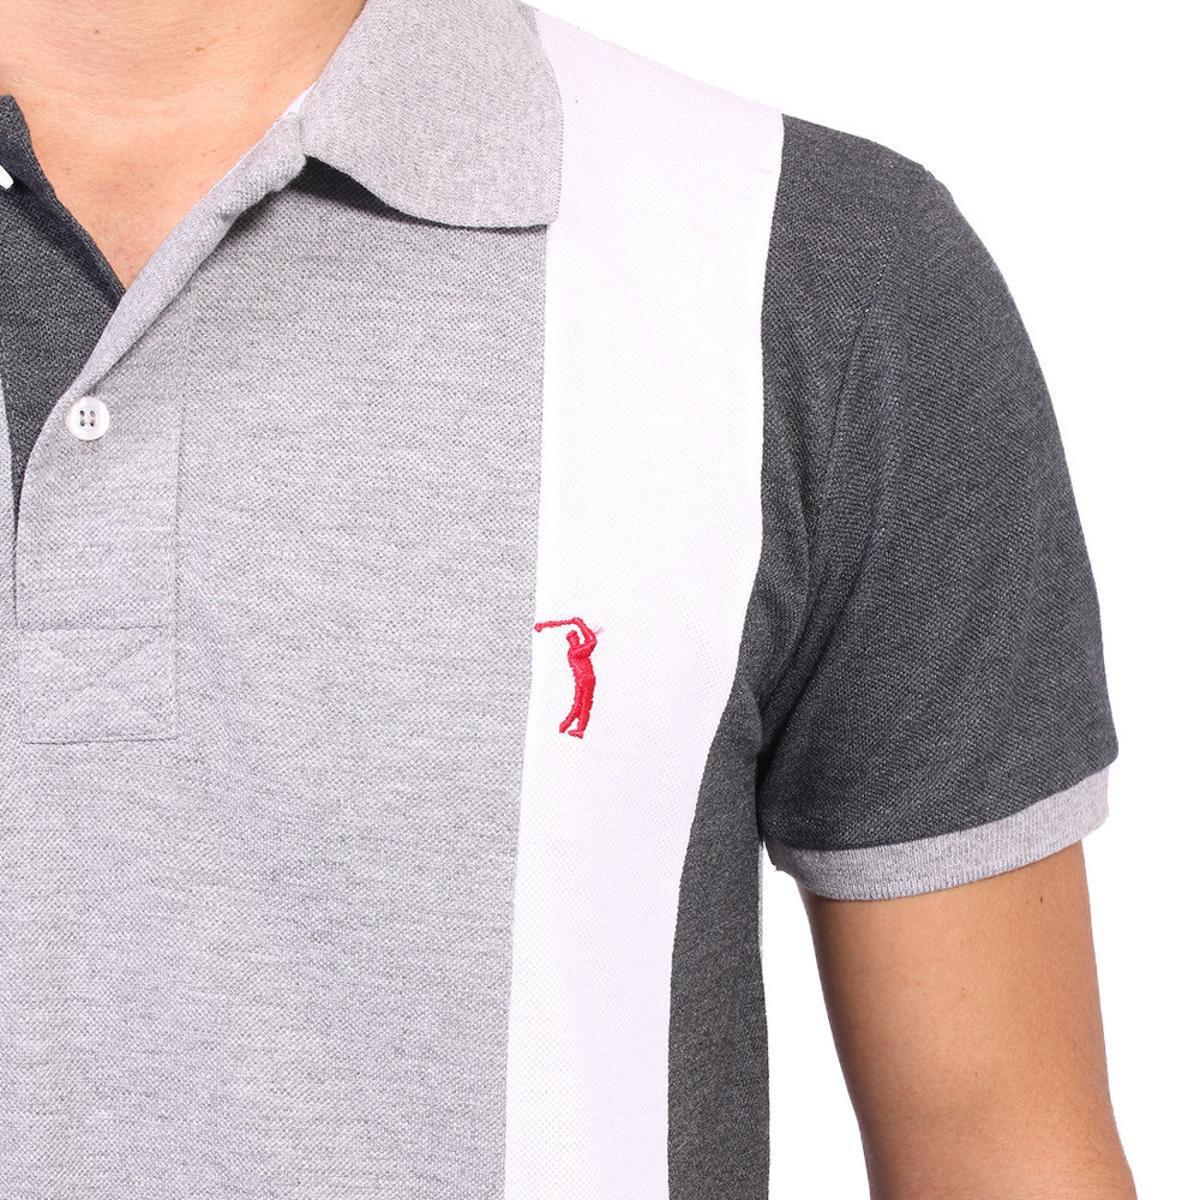 Camisa Polo Golf Club Listrada Masculina - Cinza e Chumbo - Compre ... 3b3b278dd51f3